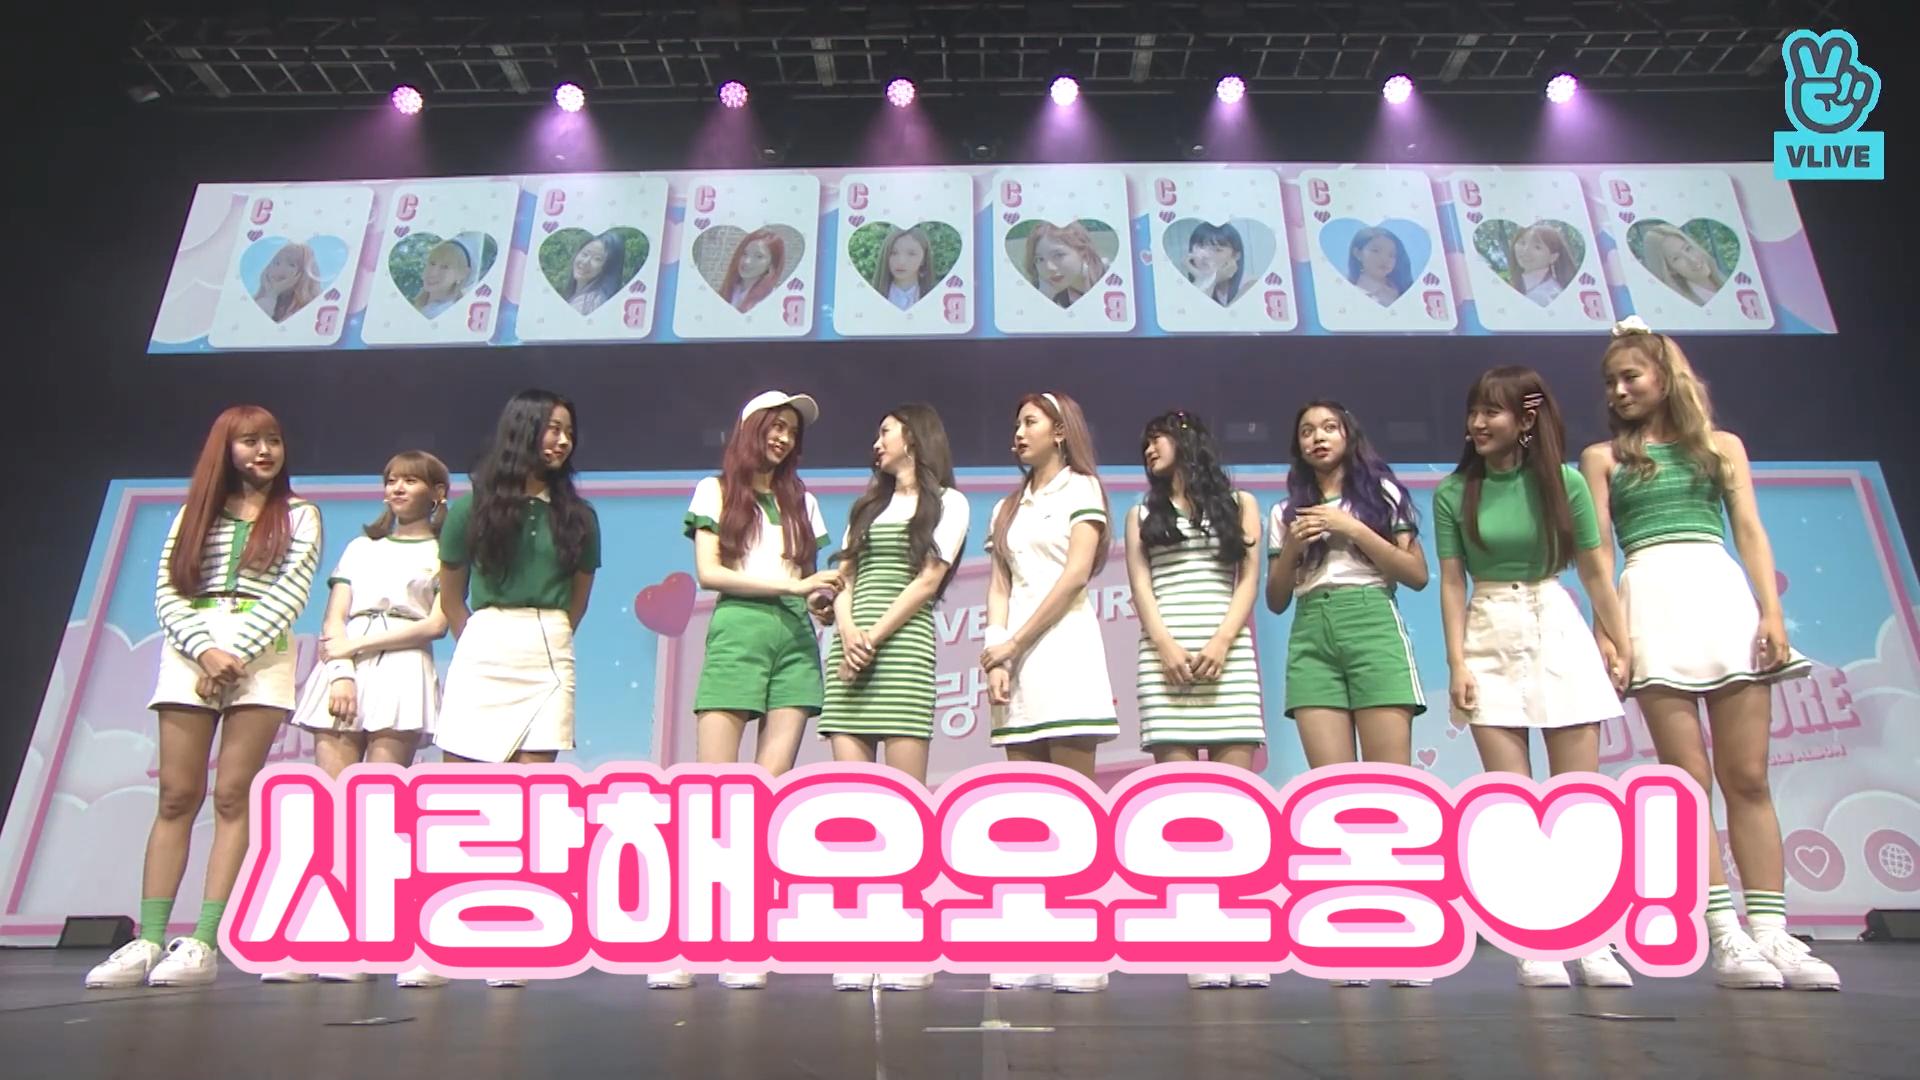 [Cherry Bullet] 공기중 사랑농도 190121% 체렛이들의 사랑해게임🍒💕 (Cherry Bullet's comeback showcase)